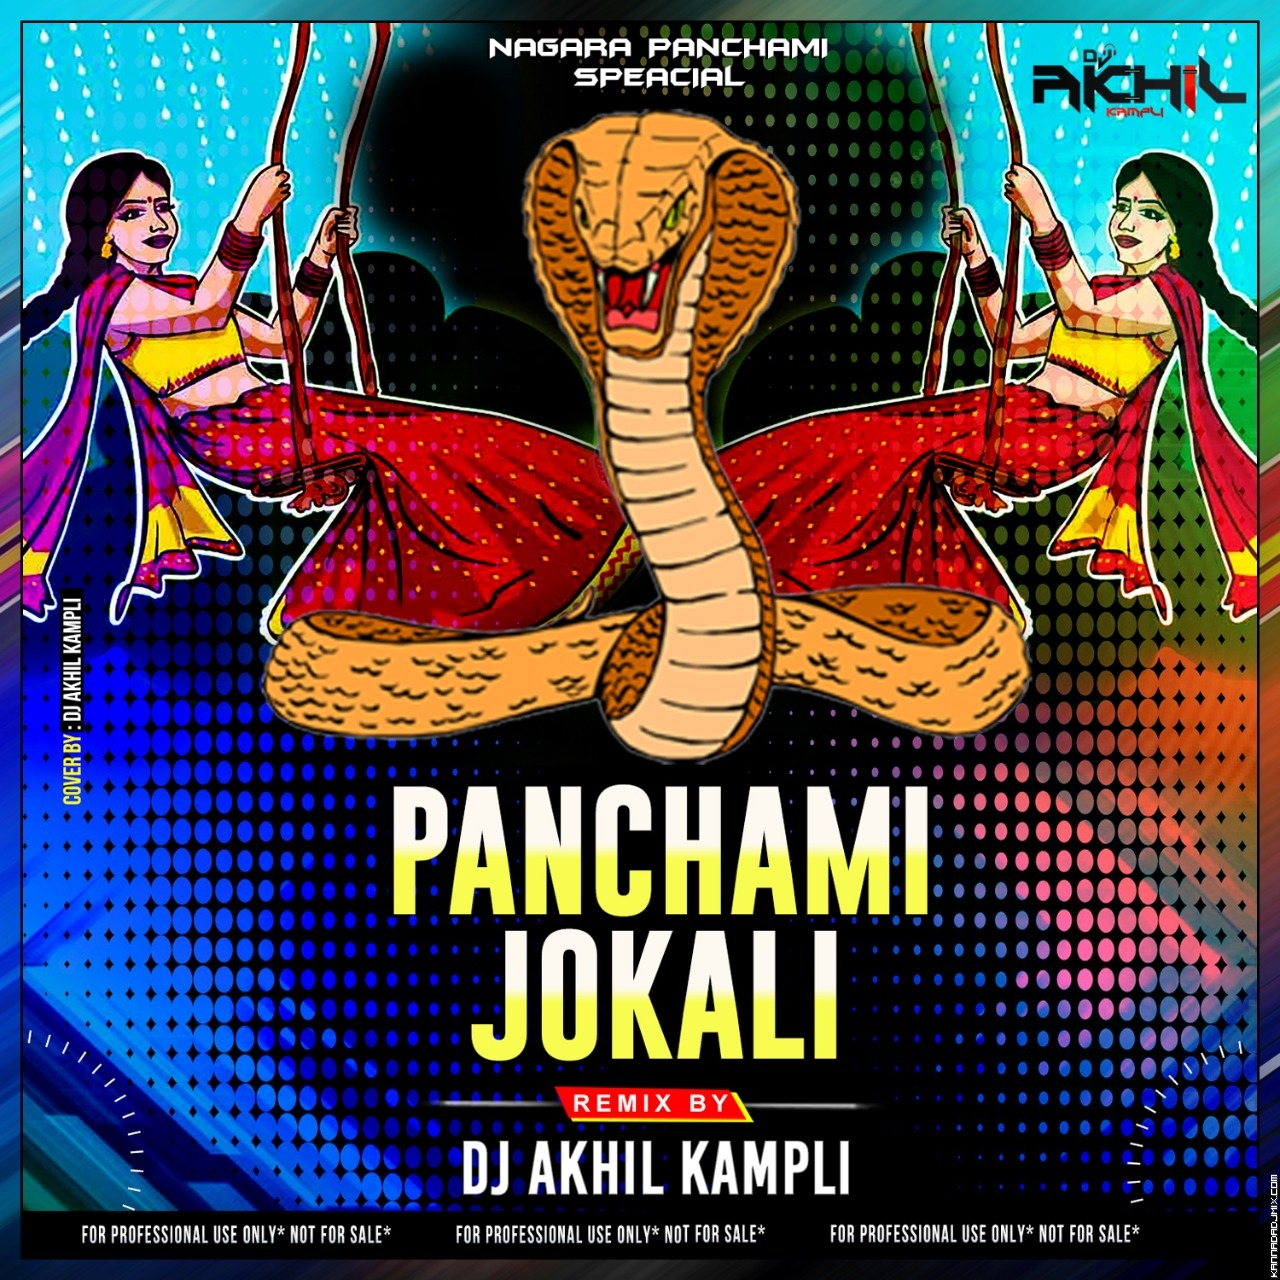 PANCHAMI-JOKALI-EDM-BASS-MIX-DJ-AKHIL-KAMPLi.mp3